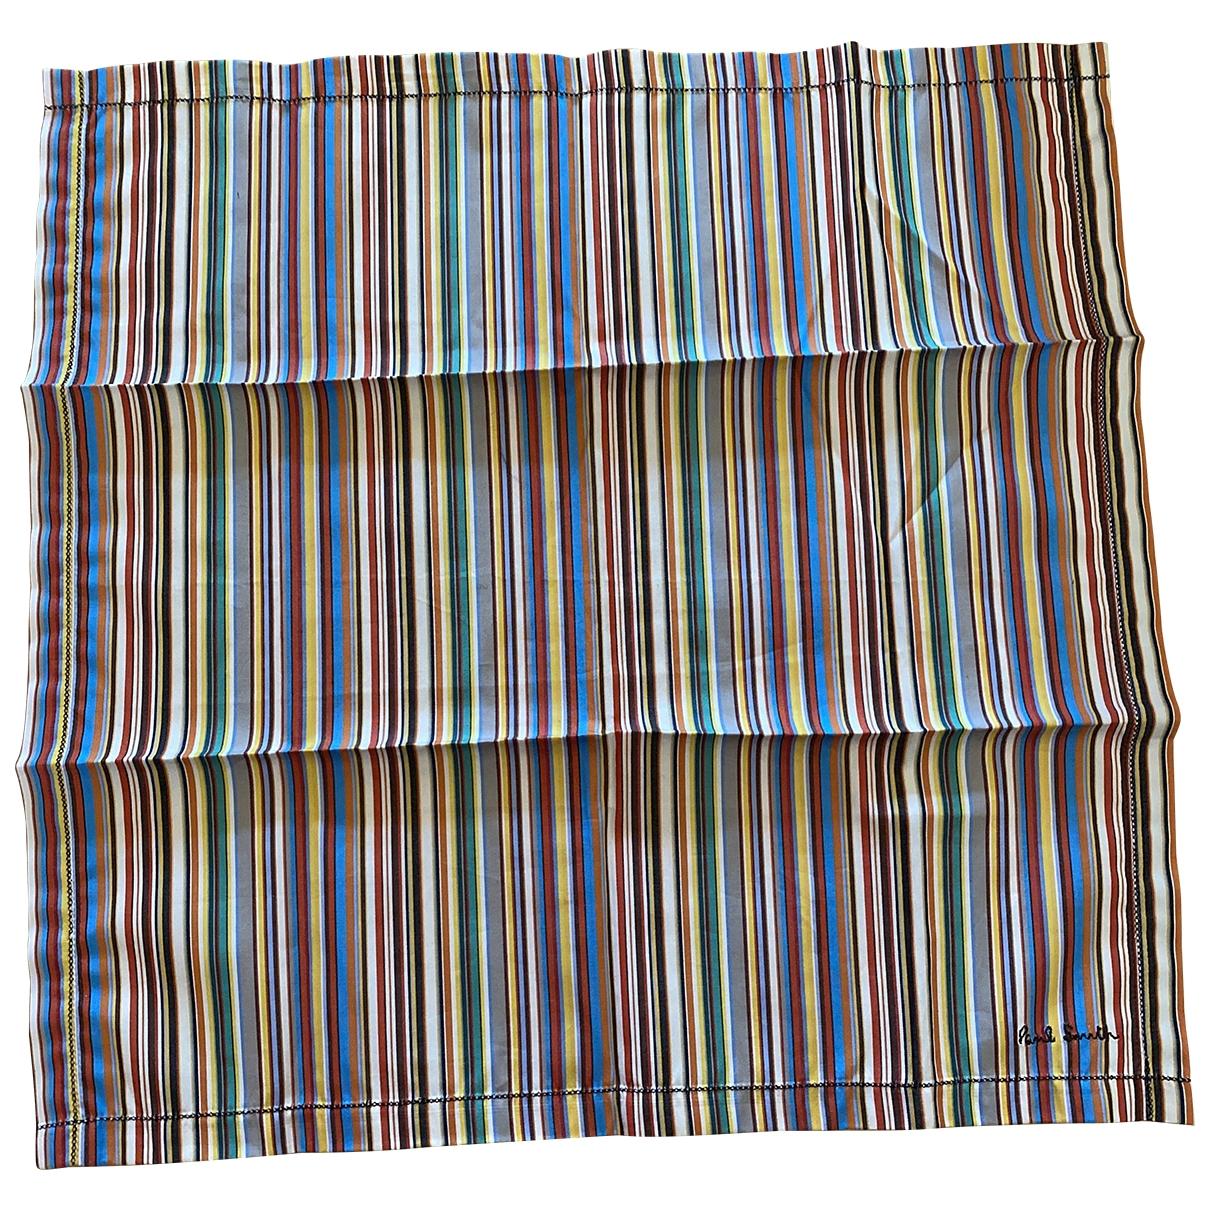 Paul Smith \N Multicolour Cotton scarf & pocket squares for Men \N